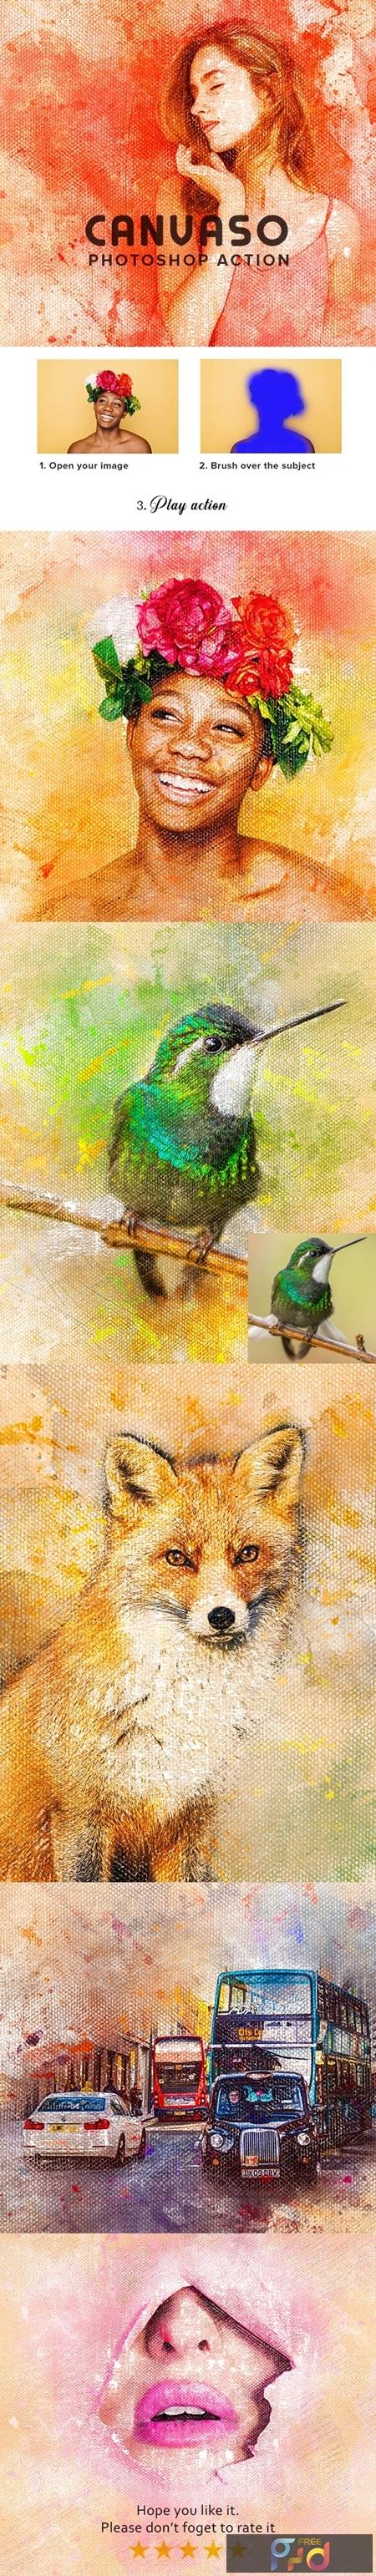 Canvaso Photoshop Action 25596185 1